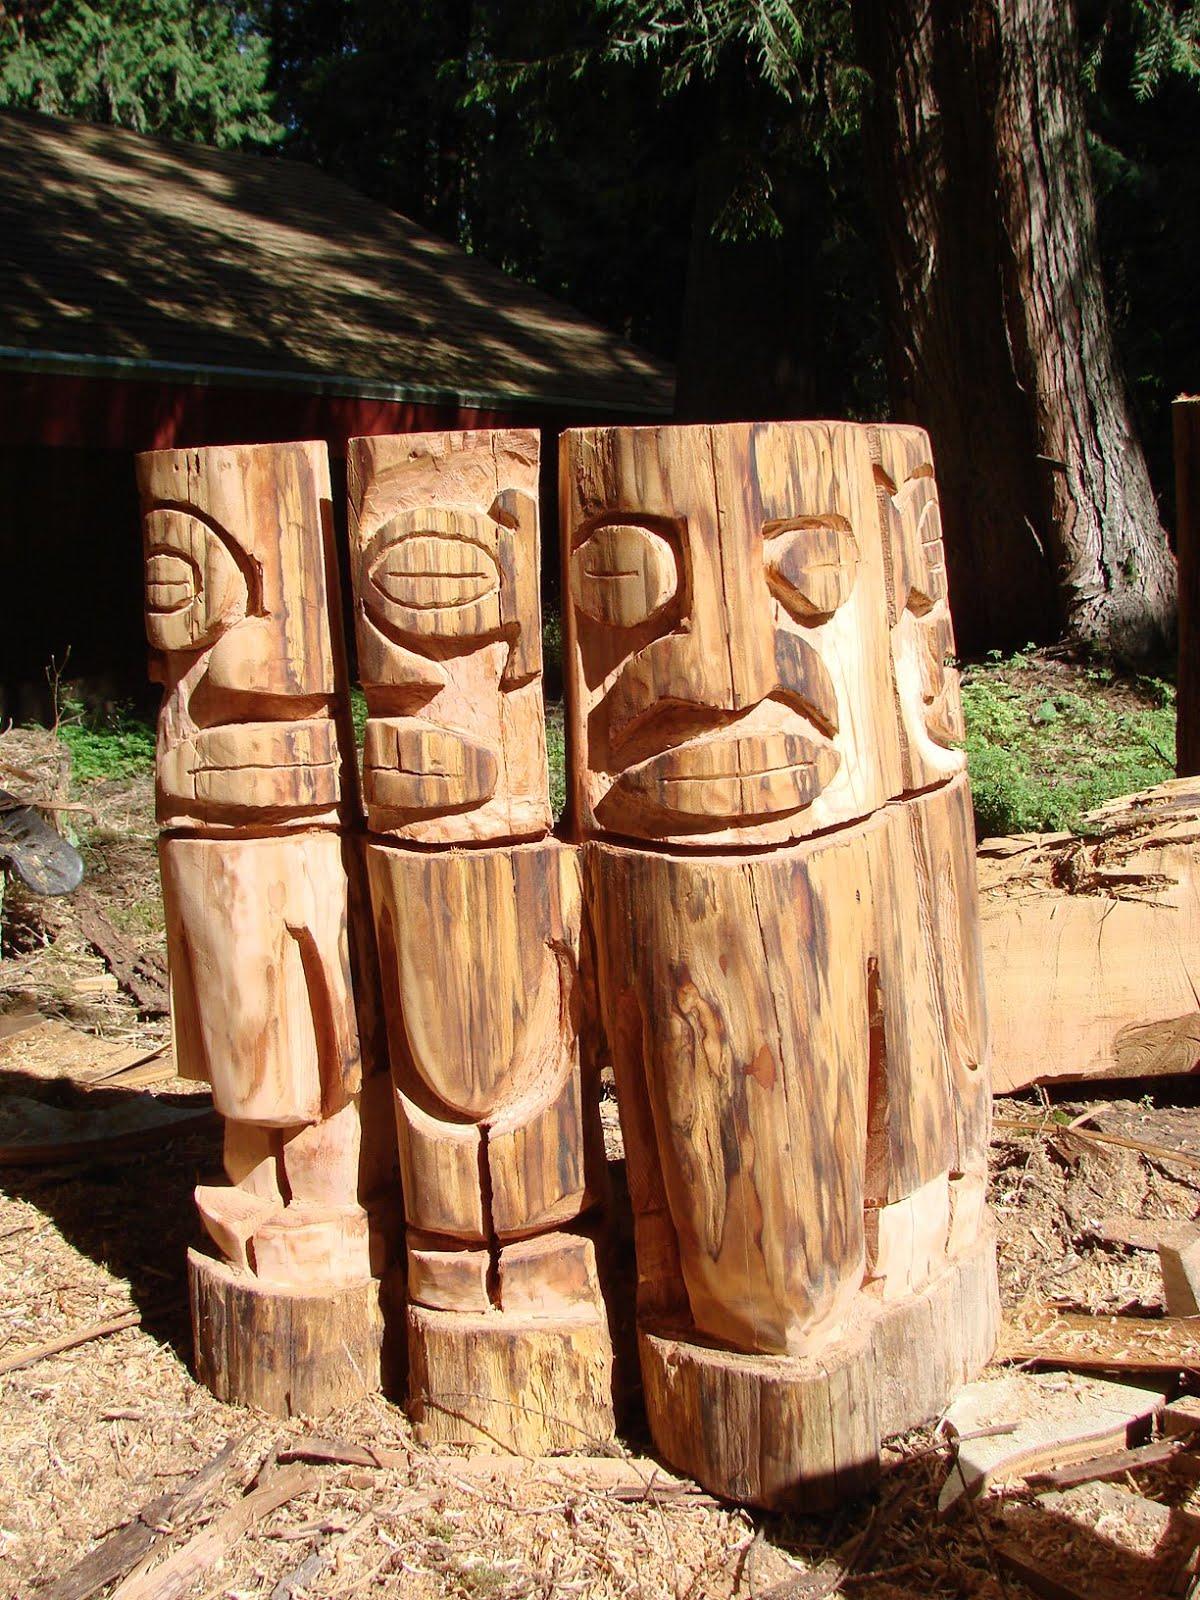 This stump of cedar got most my attention.